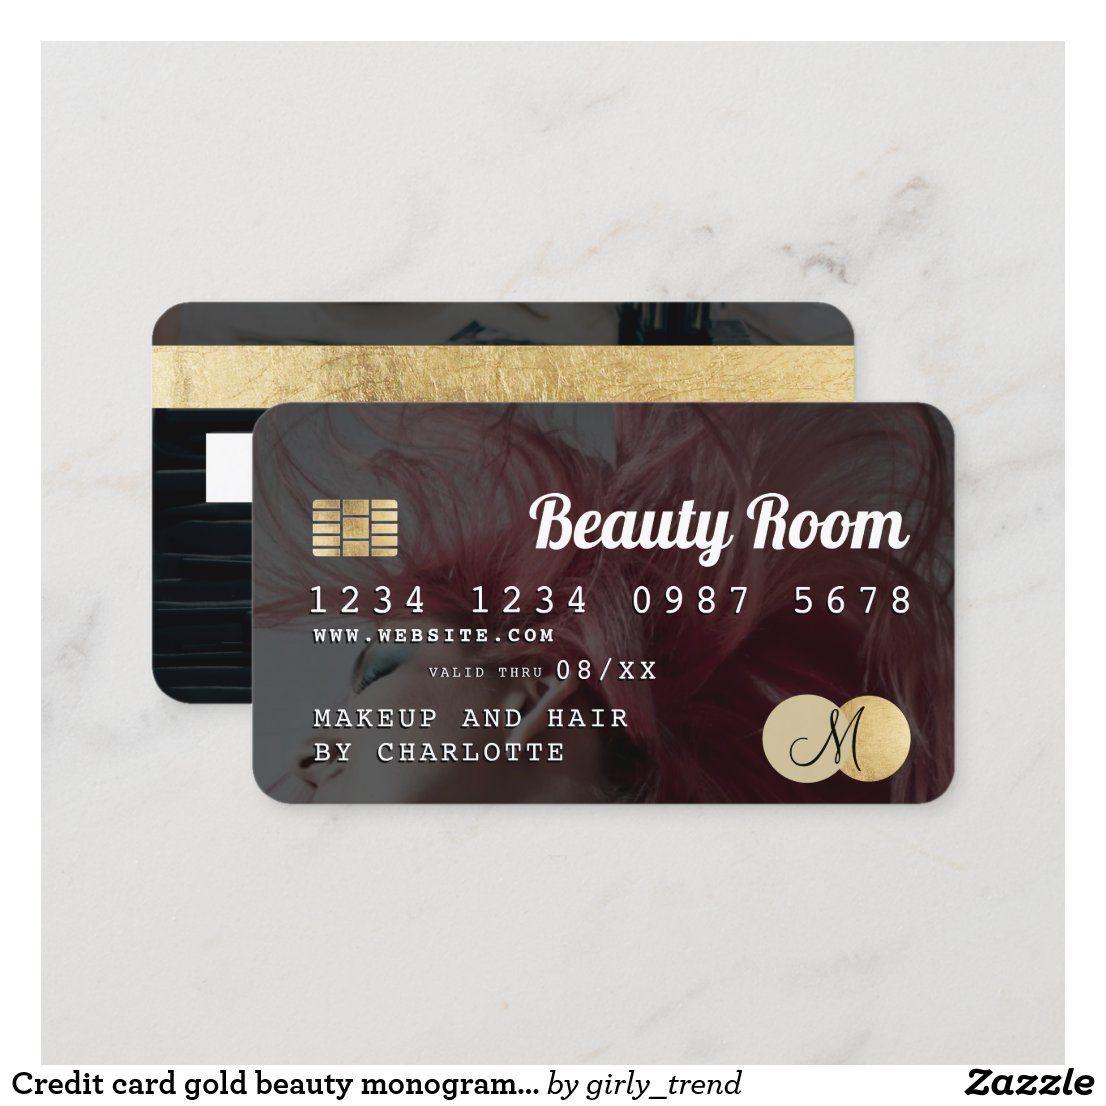 Credit Card Gold Beauty Monogram Photo Zazzle Com Gold Beauty Hair Business Cards Monogram